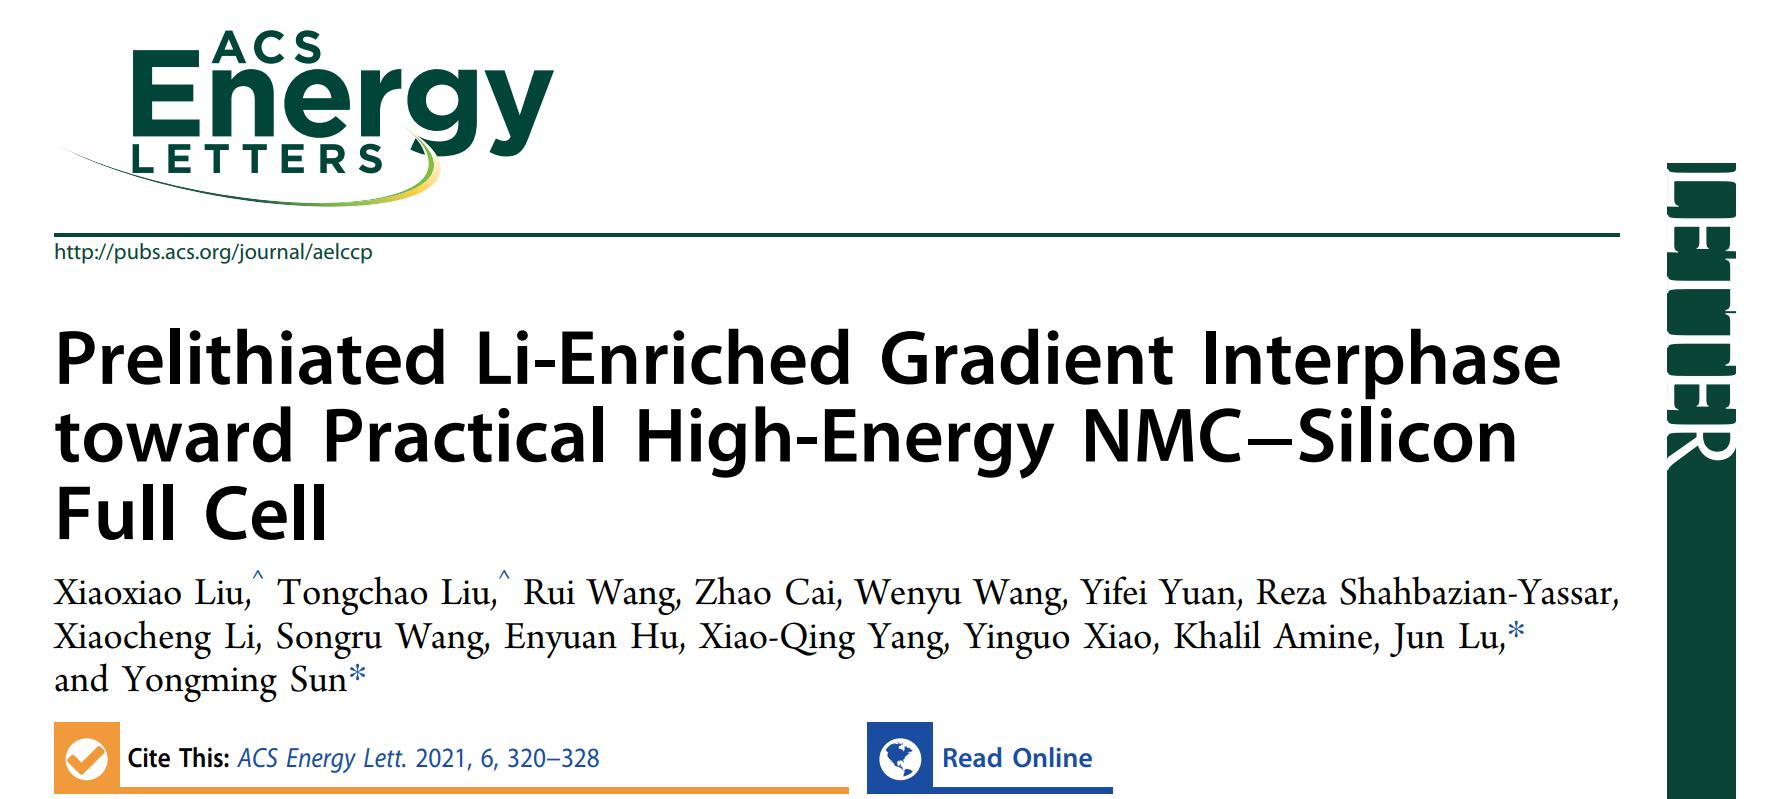 ACS Energy Letters: 高镍表面梯度富锂化助力高能量密度NMC-Si全电池